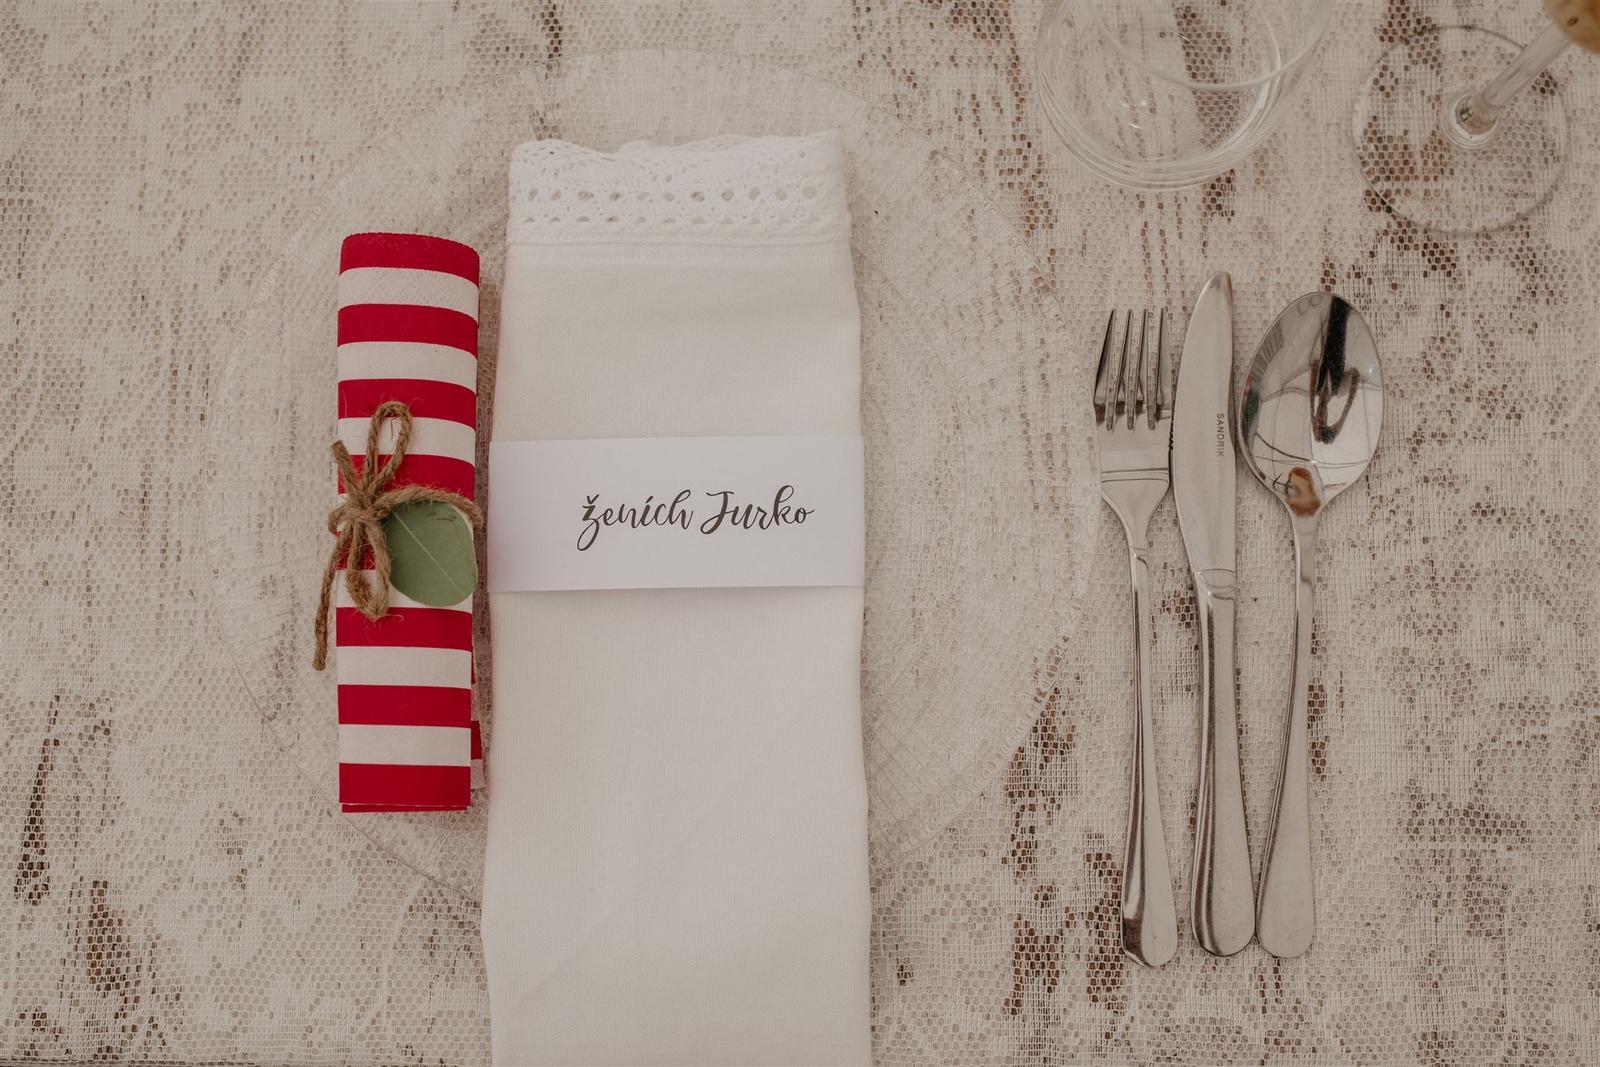 Krásna a romantická svadobná party v záhrade reštaurácie Bistra Dukát - Le Gout v srdci B. Bystrice. - Obrázok č. 8